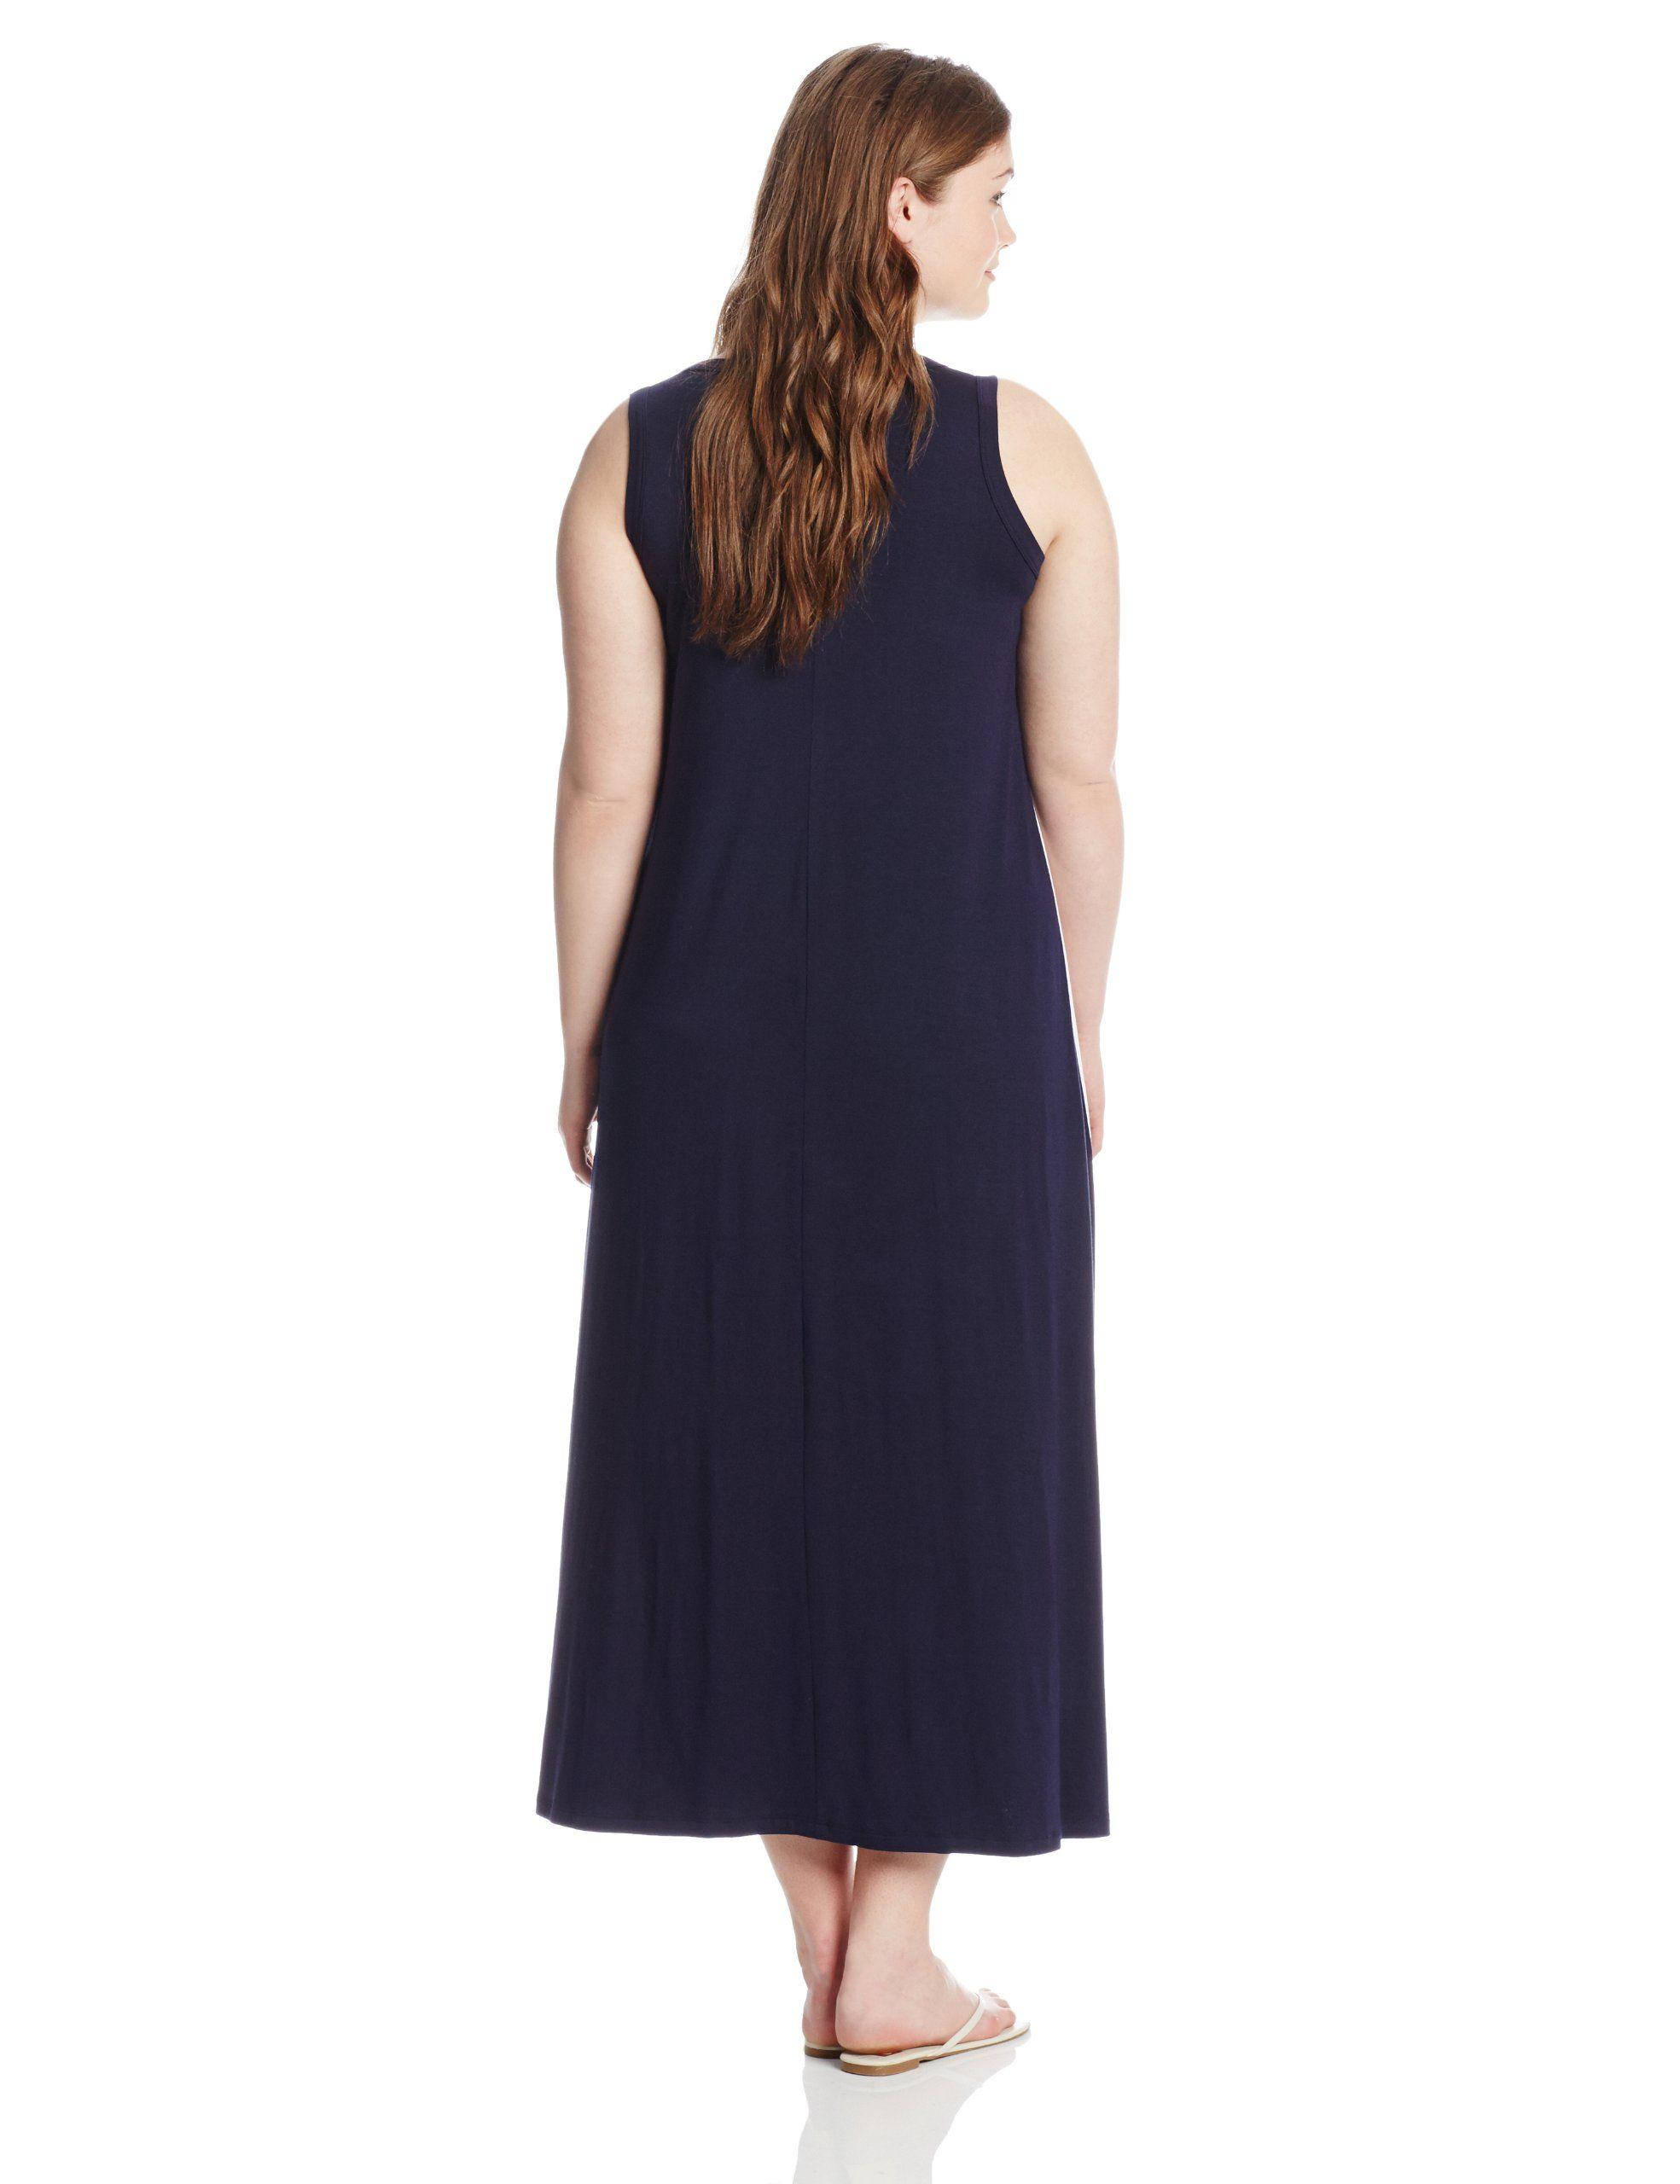 Karen Kane Women S Plus Size Fashion Navy And White Side Insert Maxi Dress Available At Amazon Women S Clothing Store Karen Plus Size Fashion Maxi Dress Women [ 2560 x 1969 Pixel ]